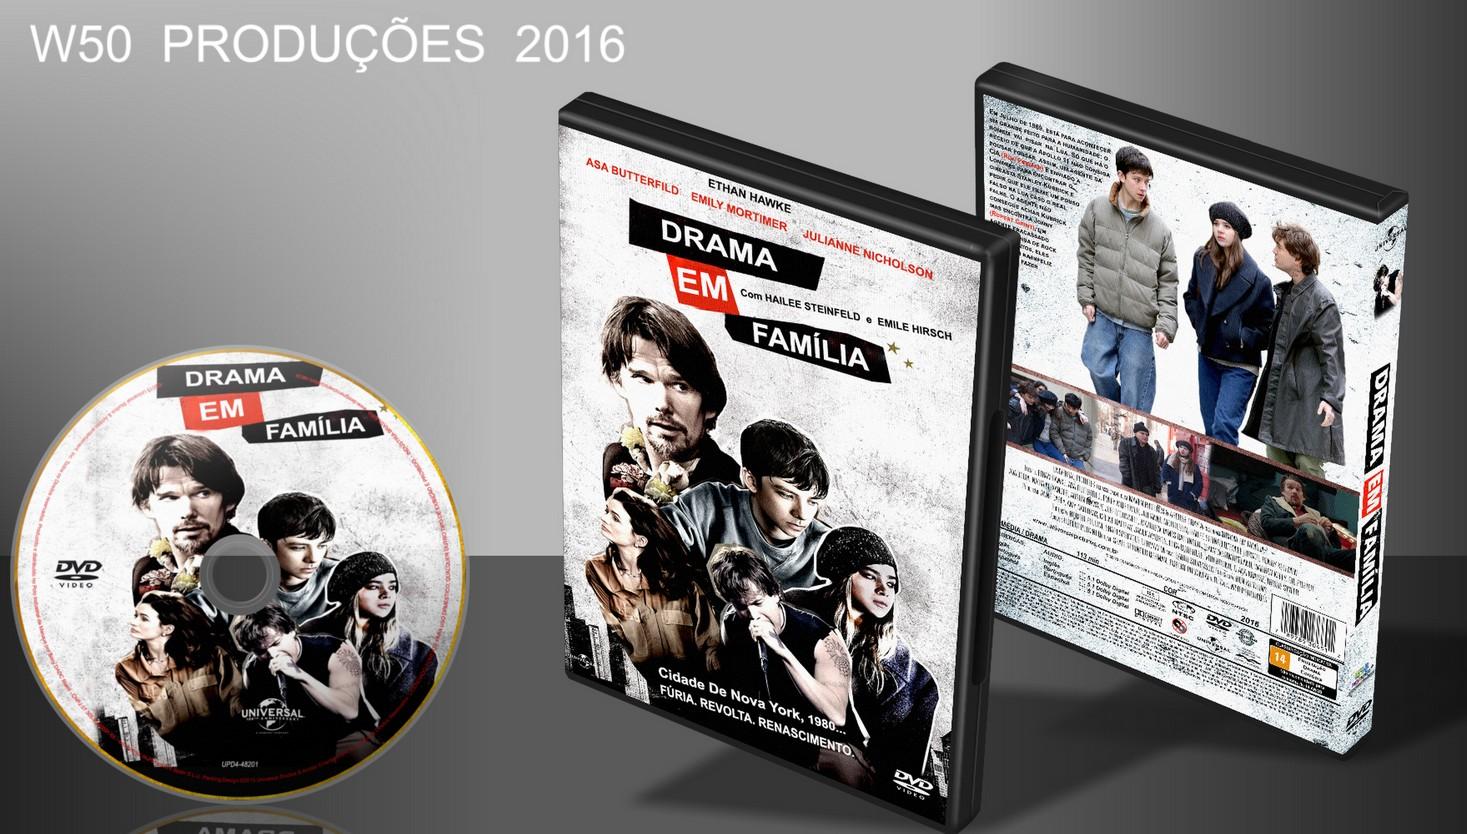 w50 produ es cds dvds blu ray drama em fam lia lan amento 2016. Black Bedroom Furniture Sets. Home Design Ideas